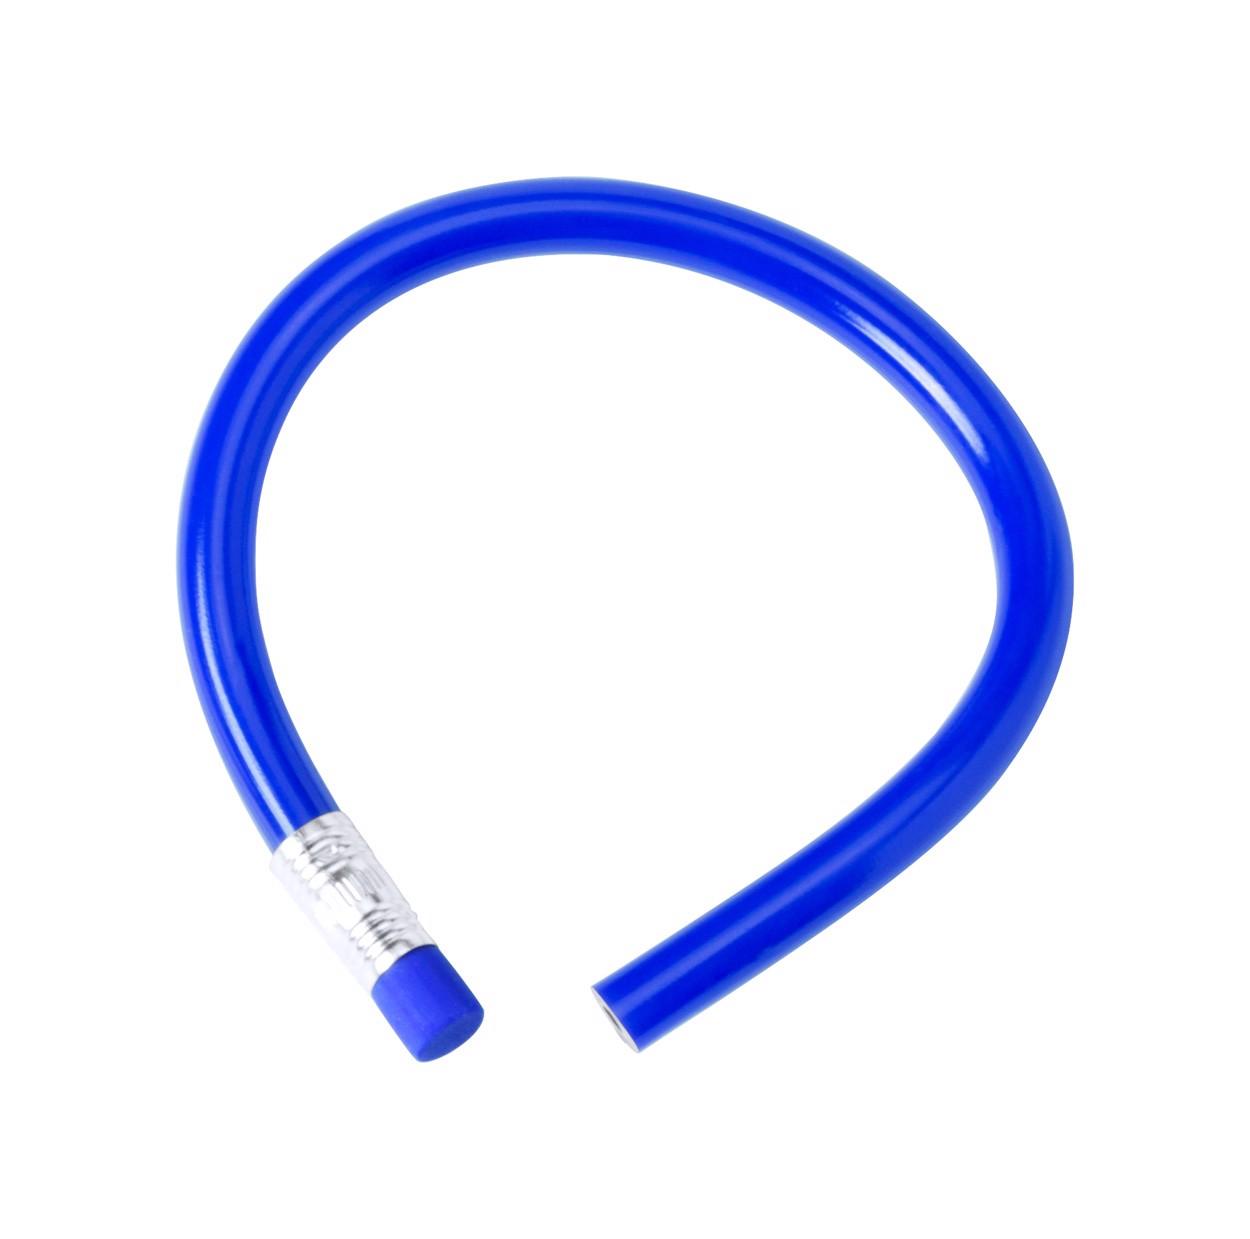 Ohebná Tužka Pimbur - Modrá